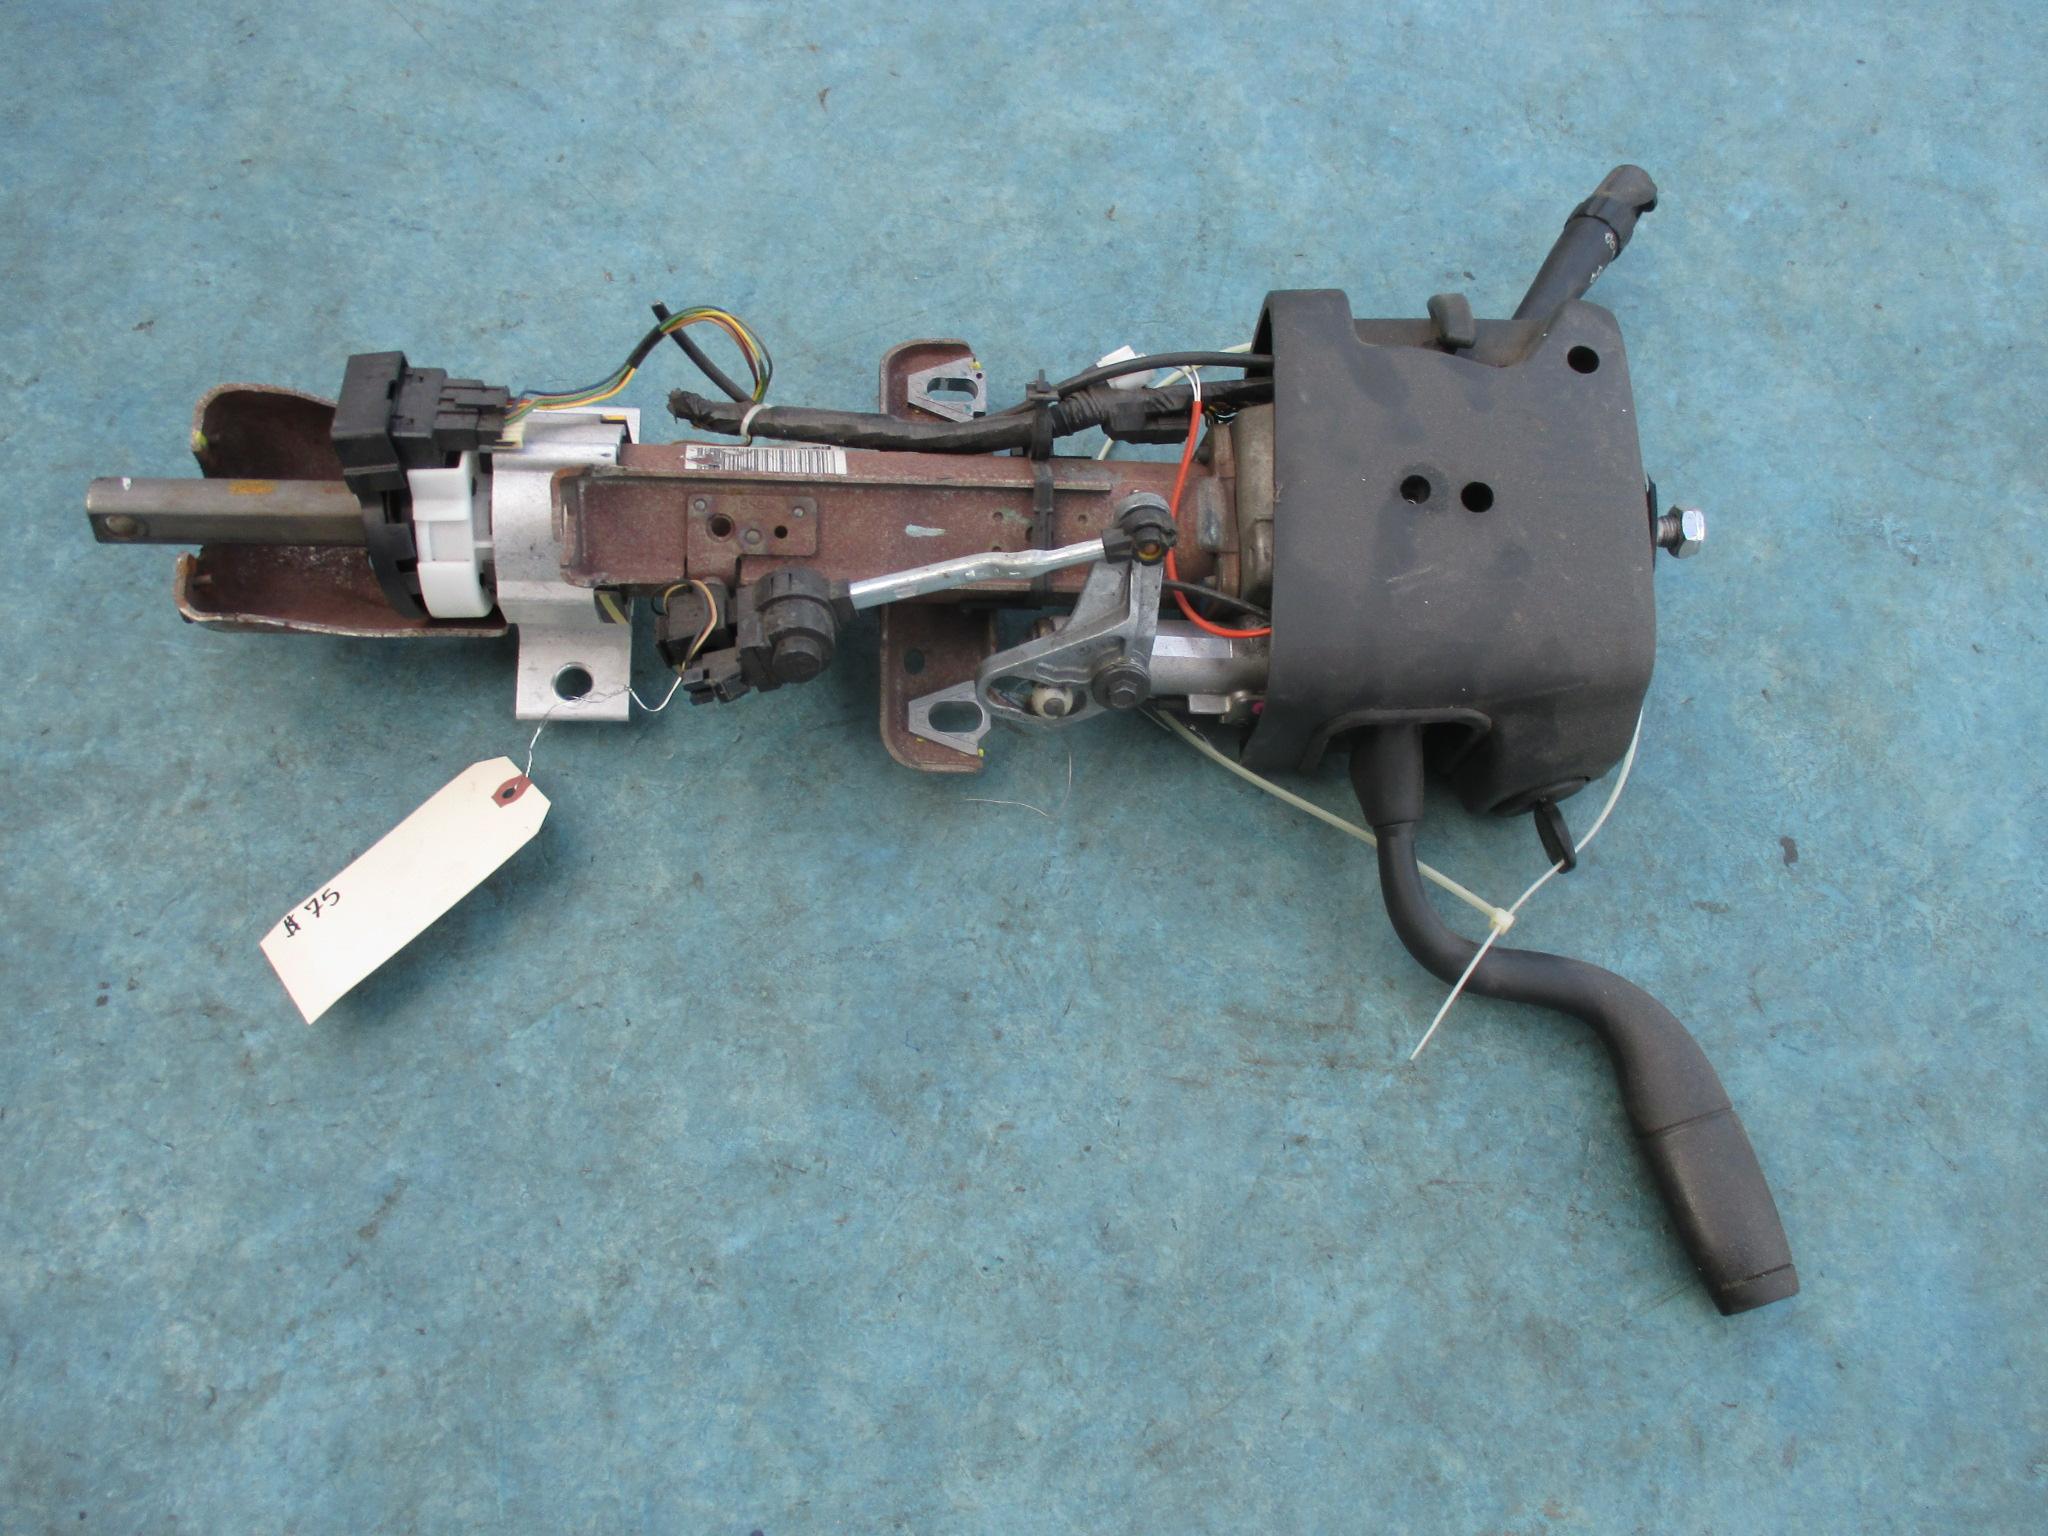 Origianal Chevy Suburban steering column key - OEM parts